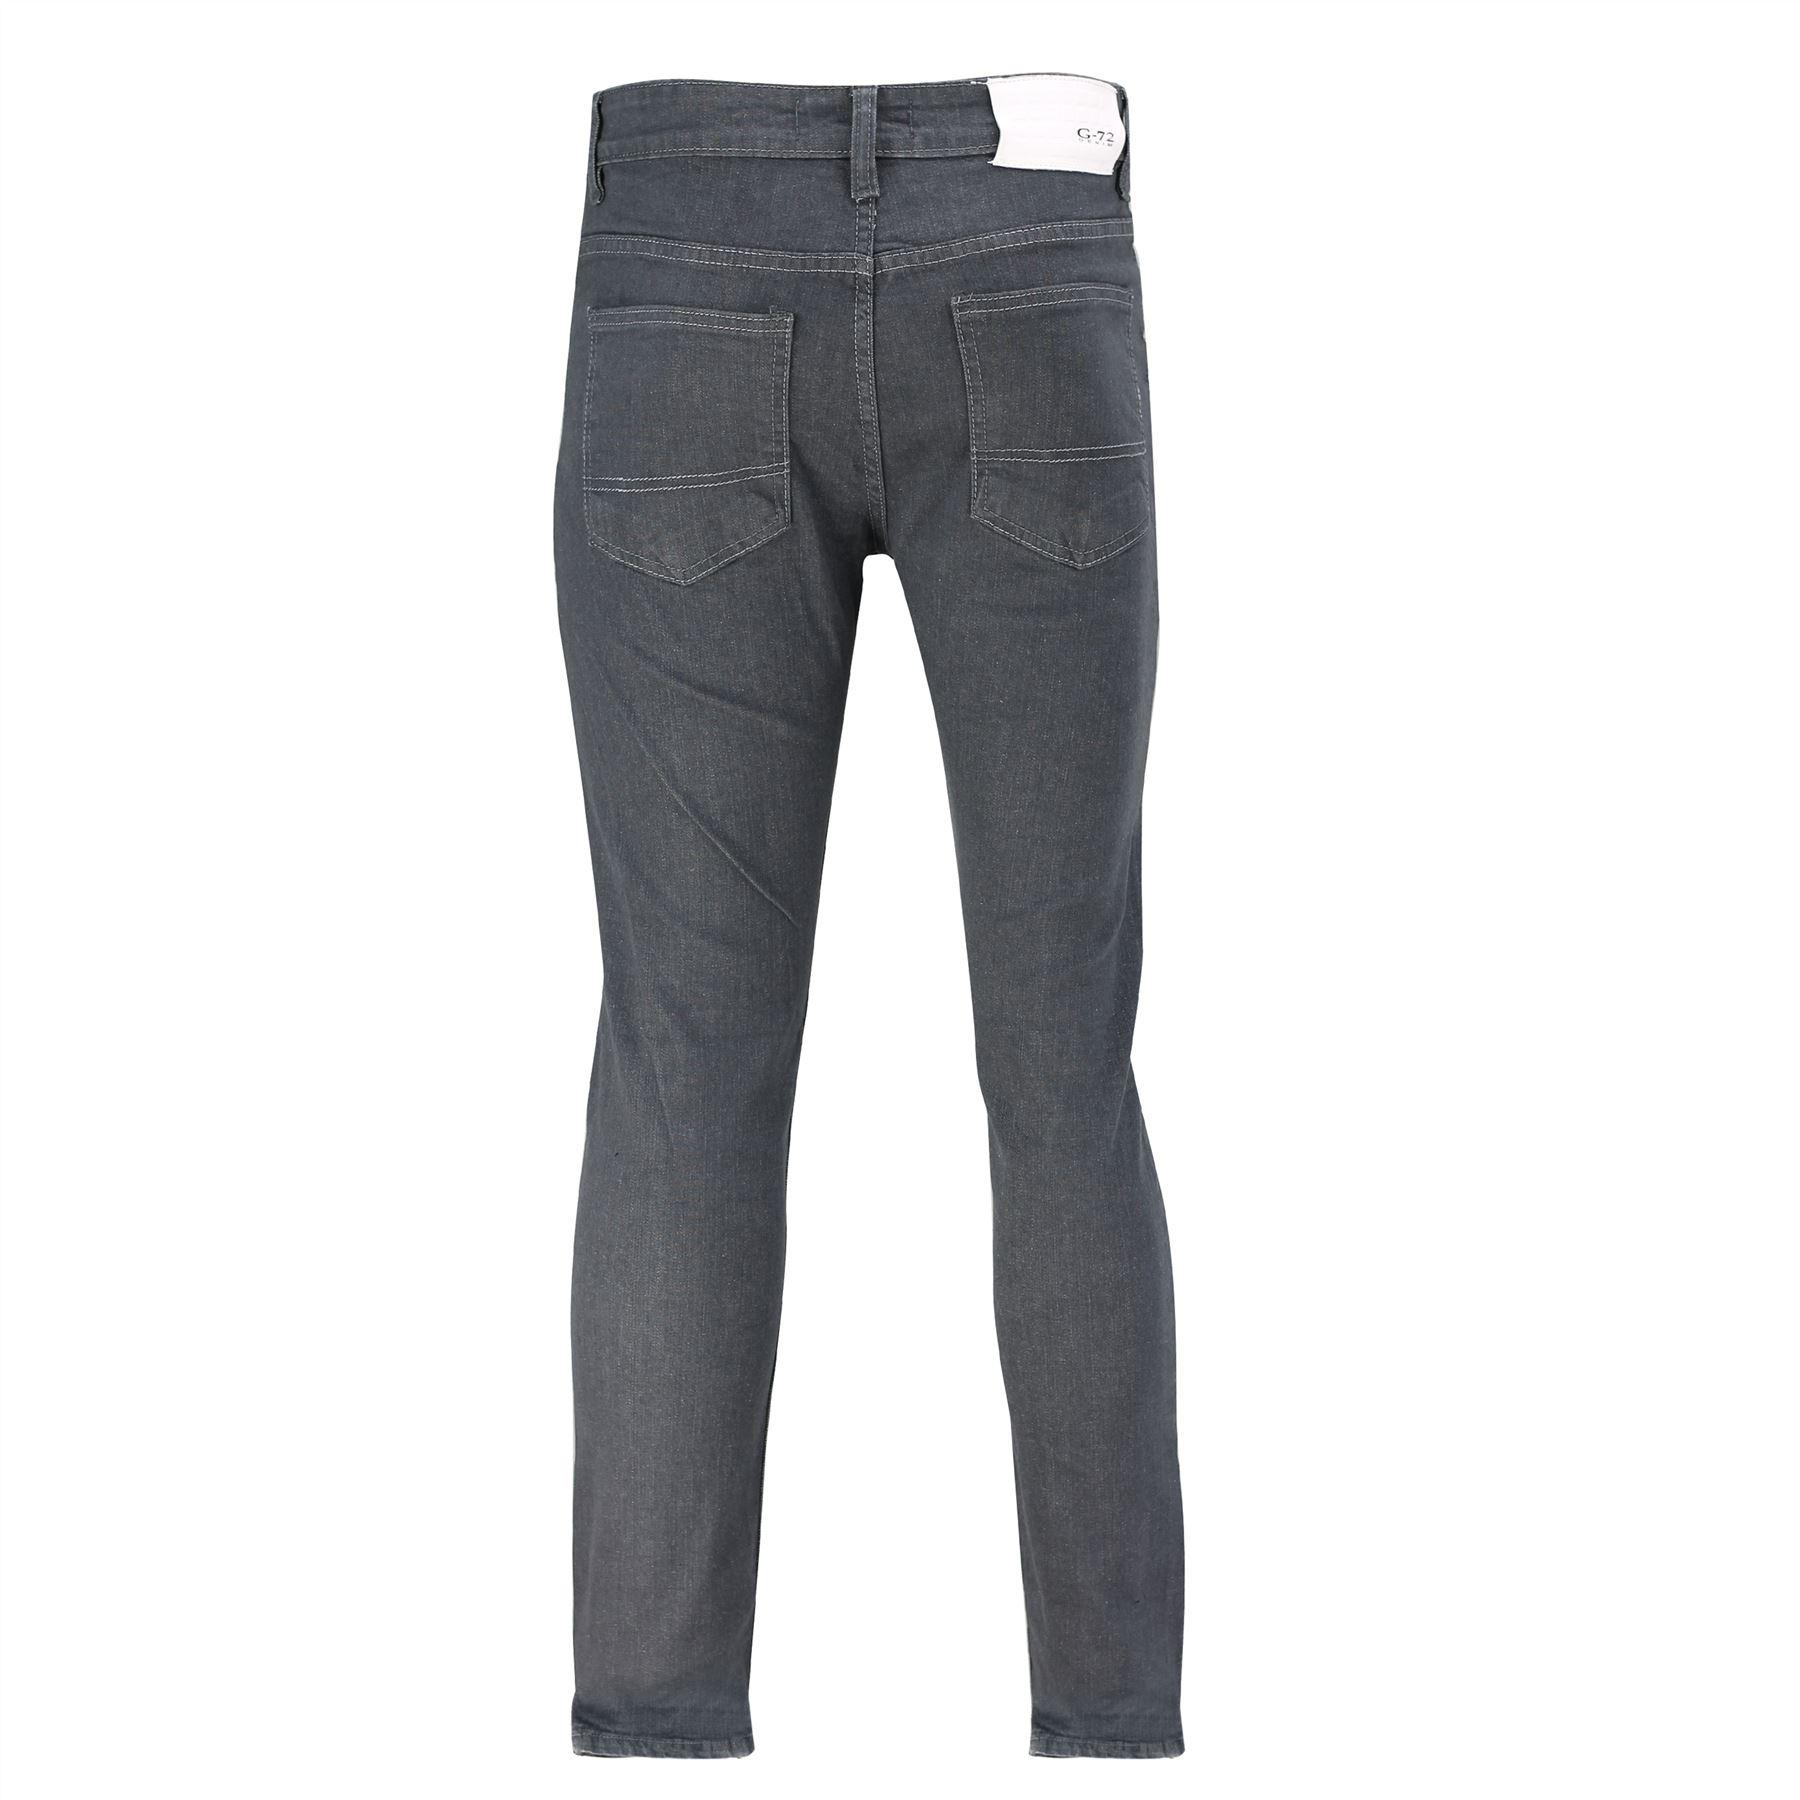 Hombre-Nuevo-G72-Super-Elastizados-Ajustados-Slim-Fit-Pantalones-De-Algodon-Pantalones-Jeans-Denim